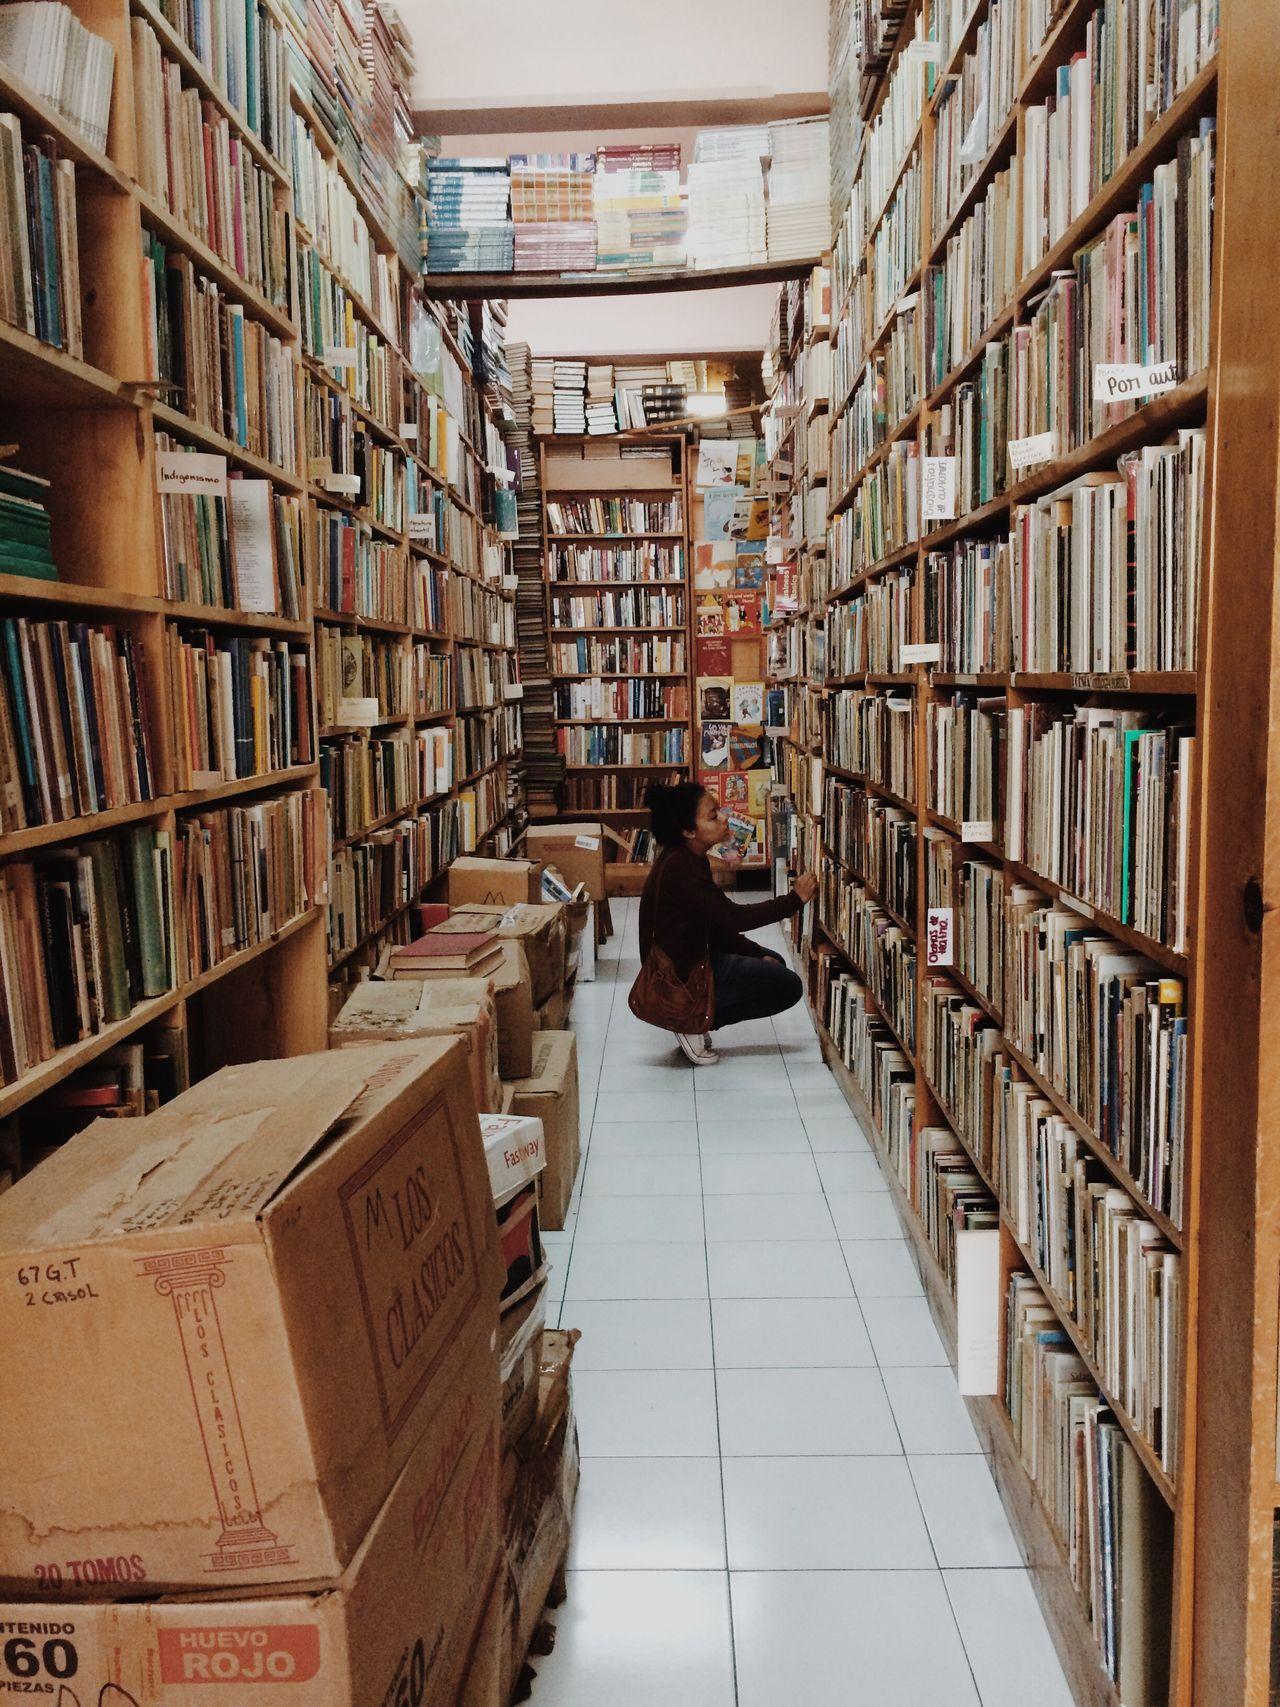 Beautiful stock photos of mexiko, shelf, bookshelf, book, adults only